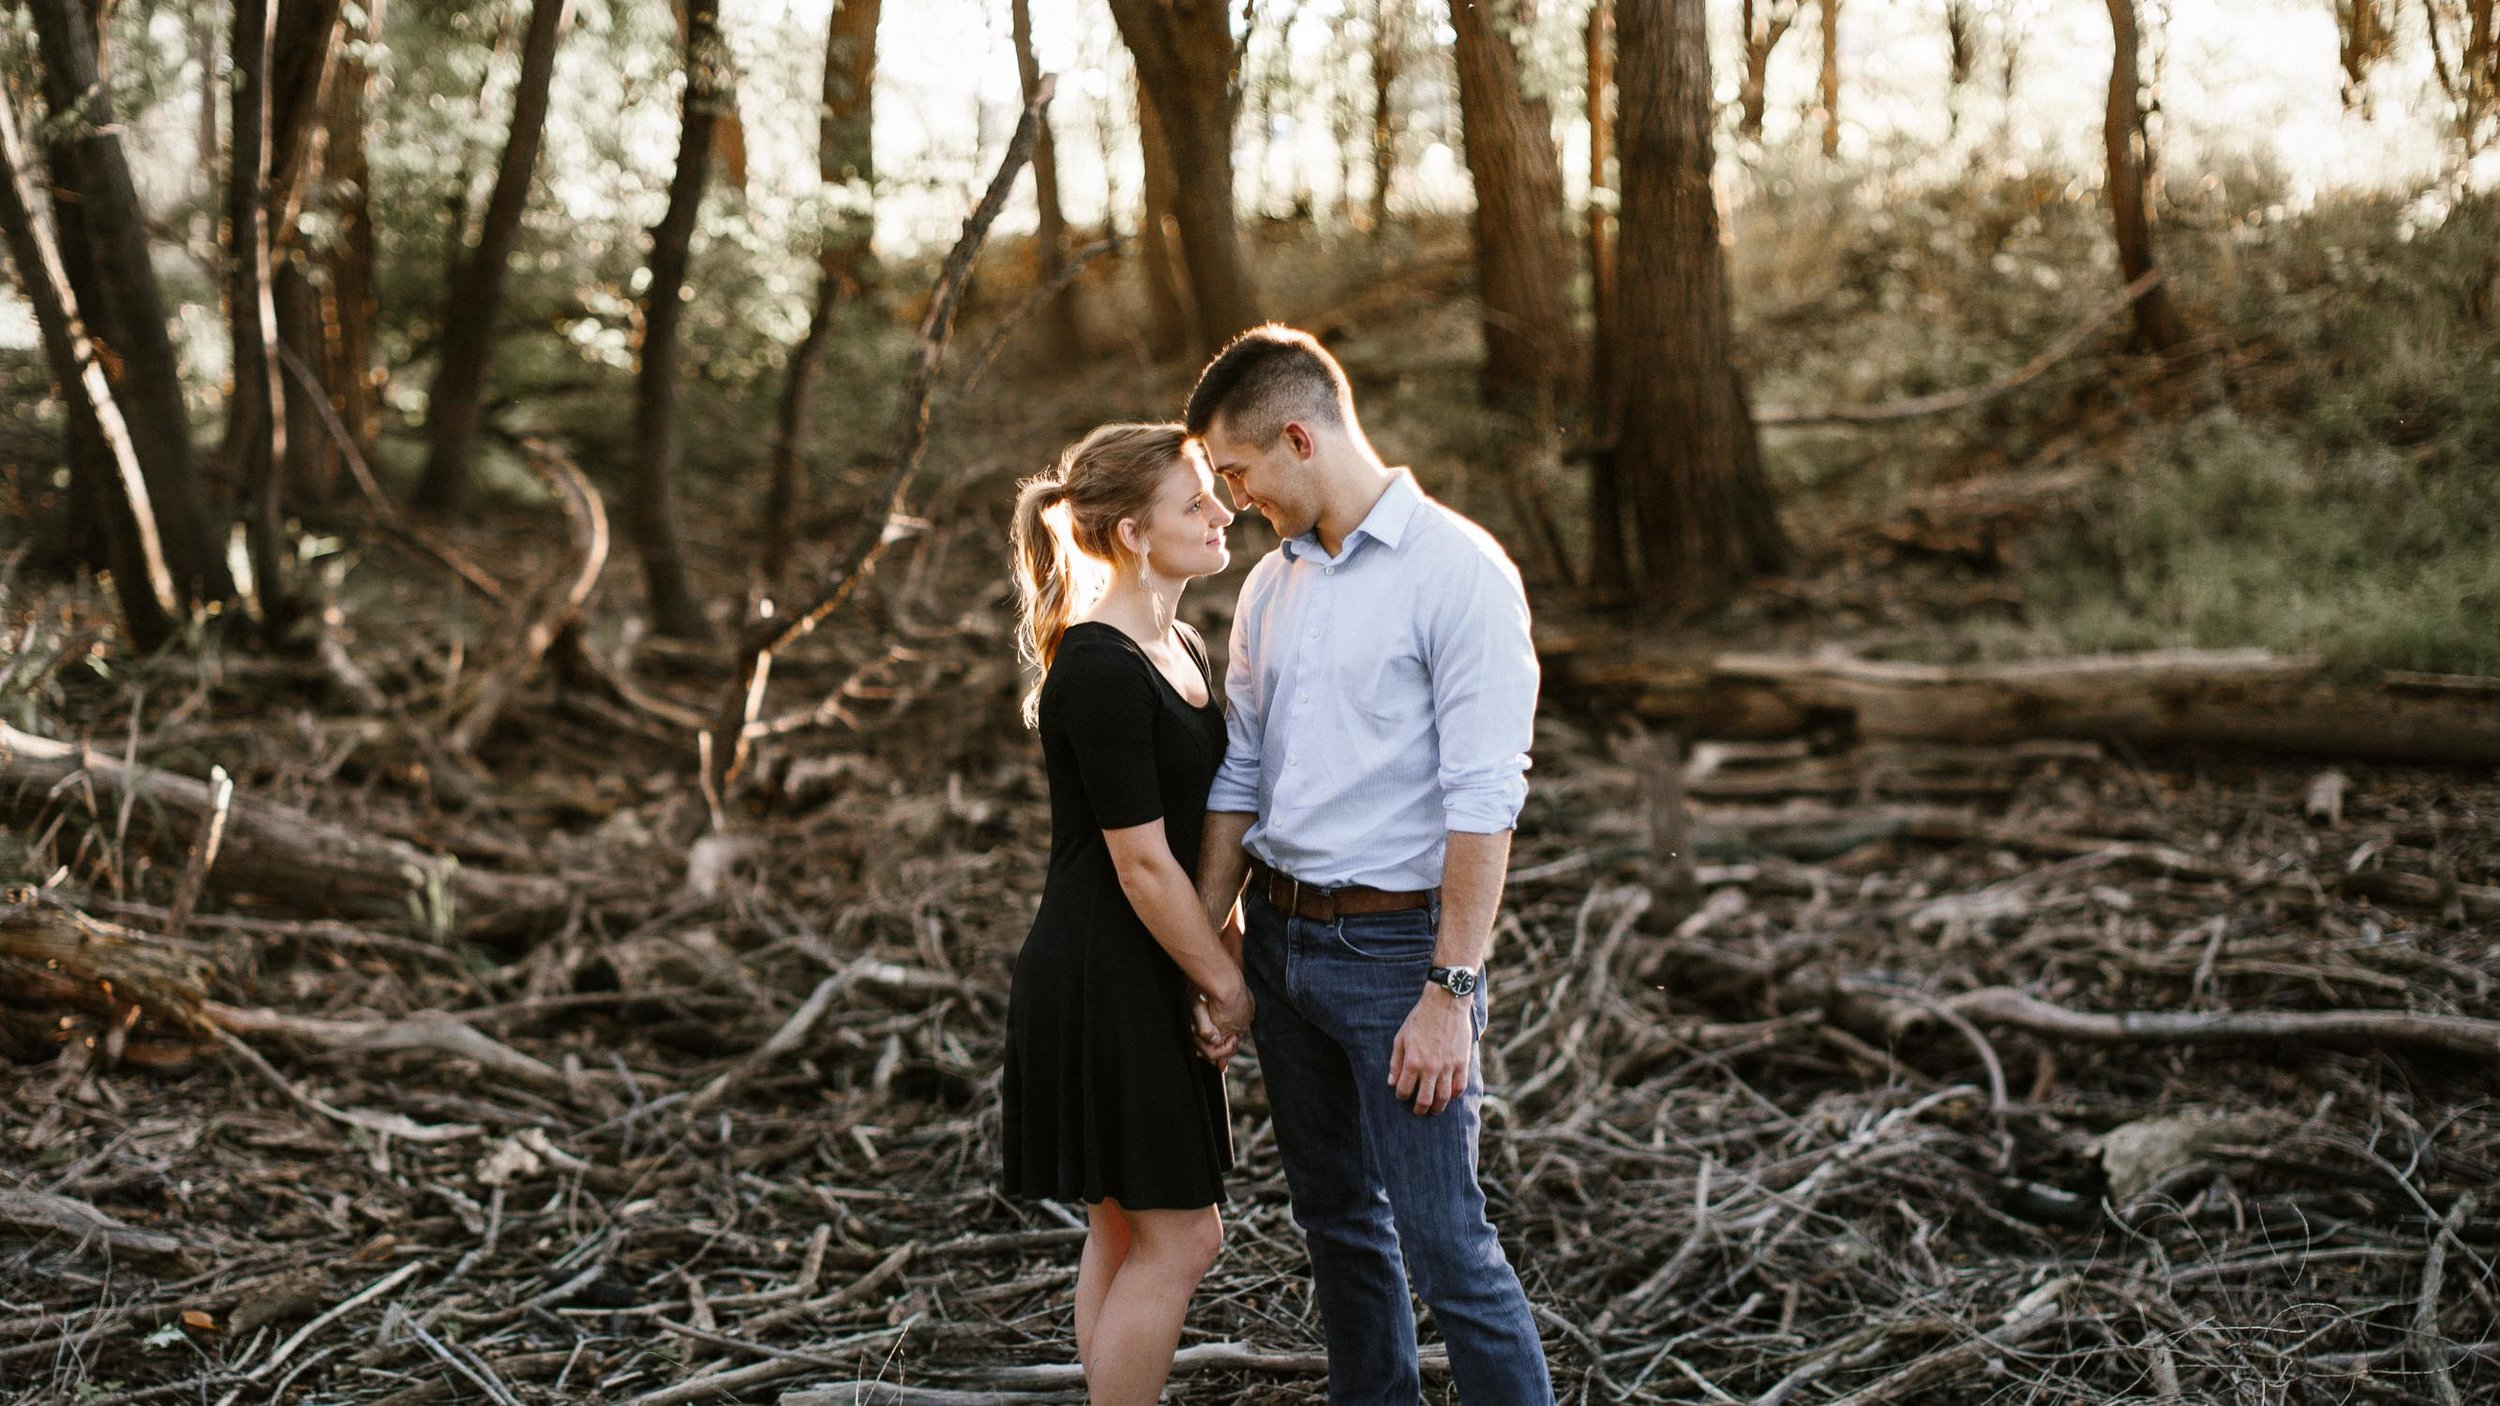 Romantic_Timeless_Downtown_SiouxFalls_Engagement_Wedding_Photographer_46.jpg